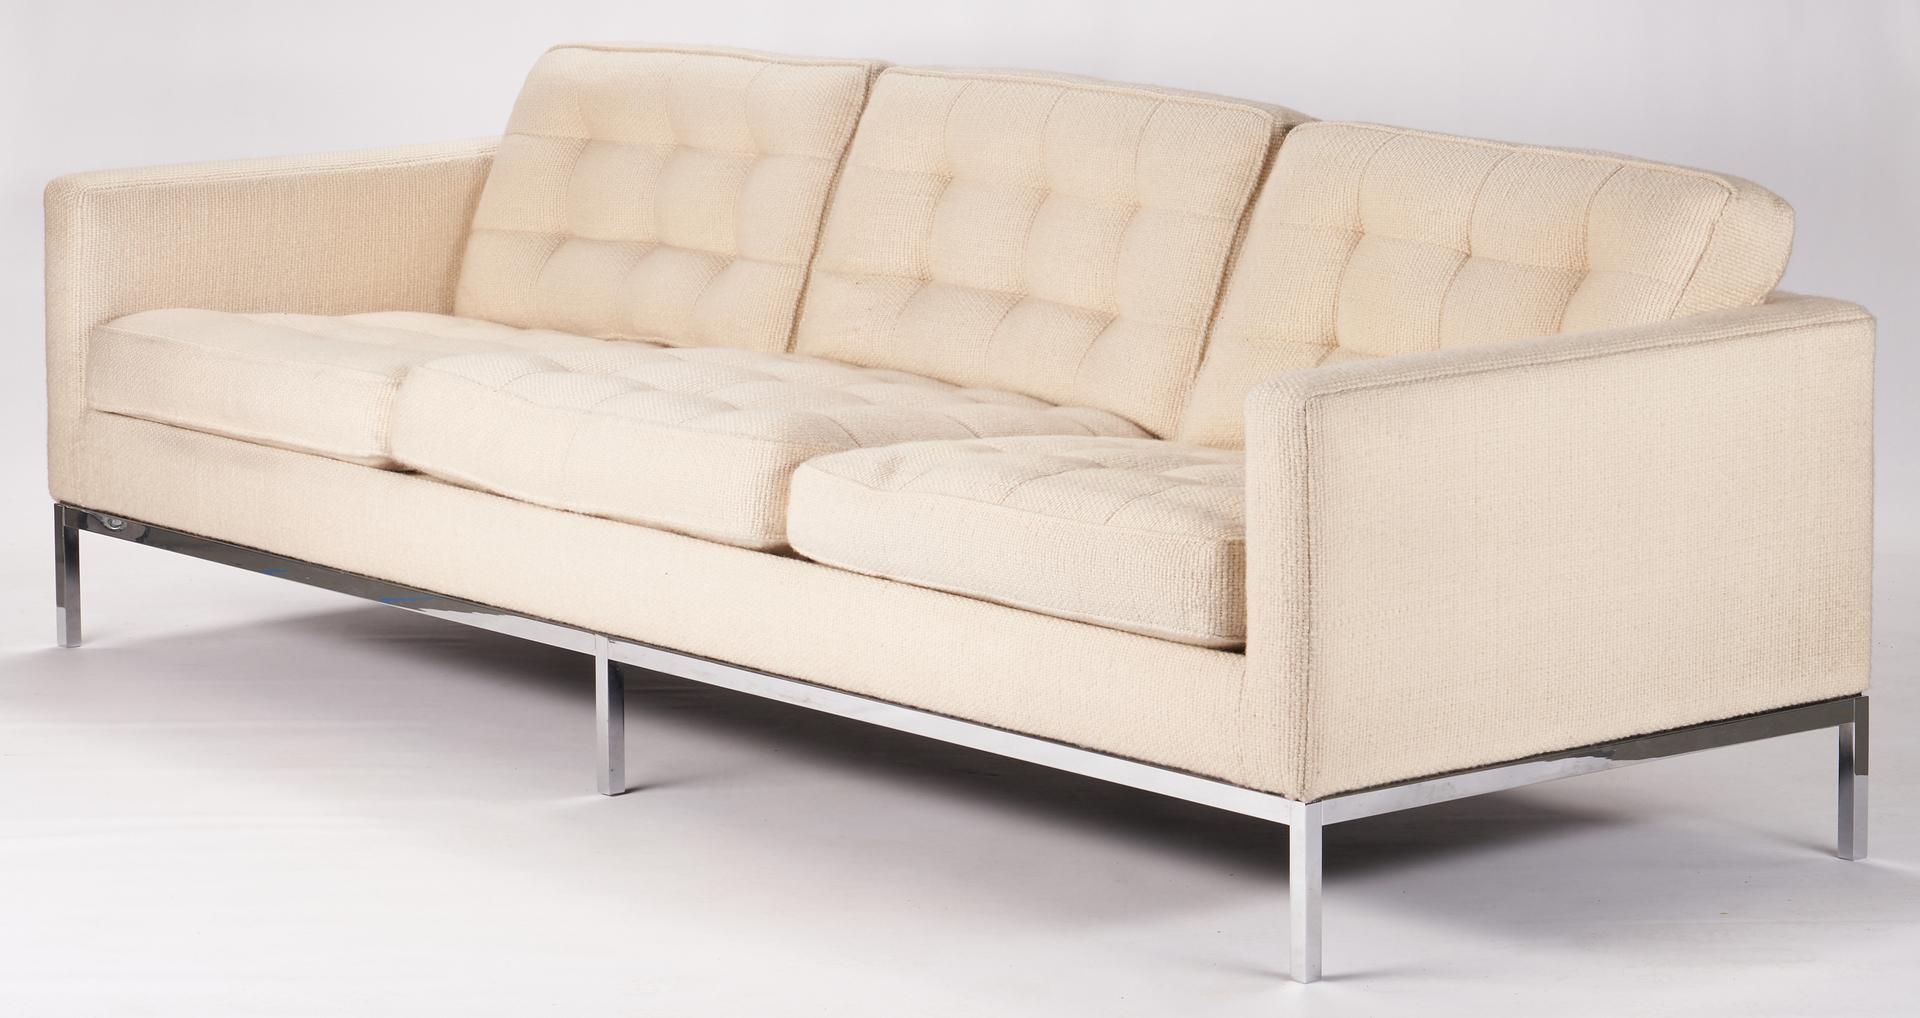 Lot 594: Mid-Century Knoll Parallel Bar System Sofa